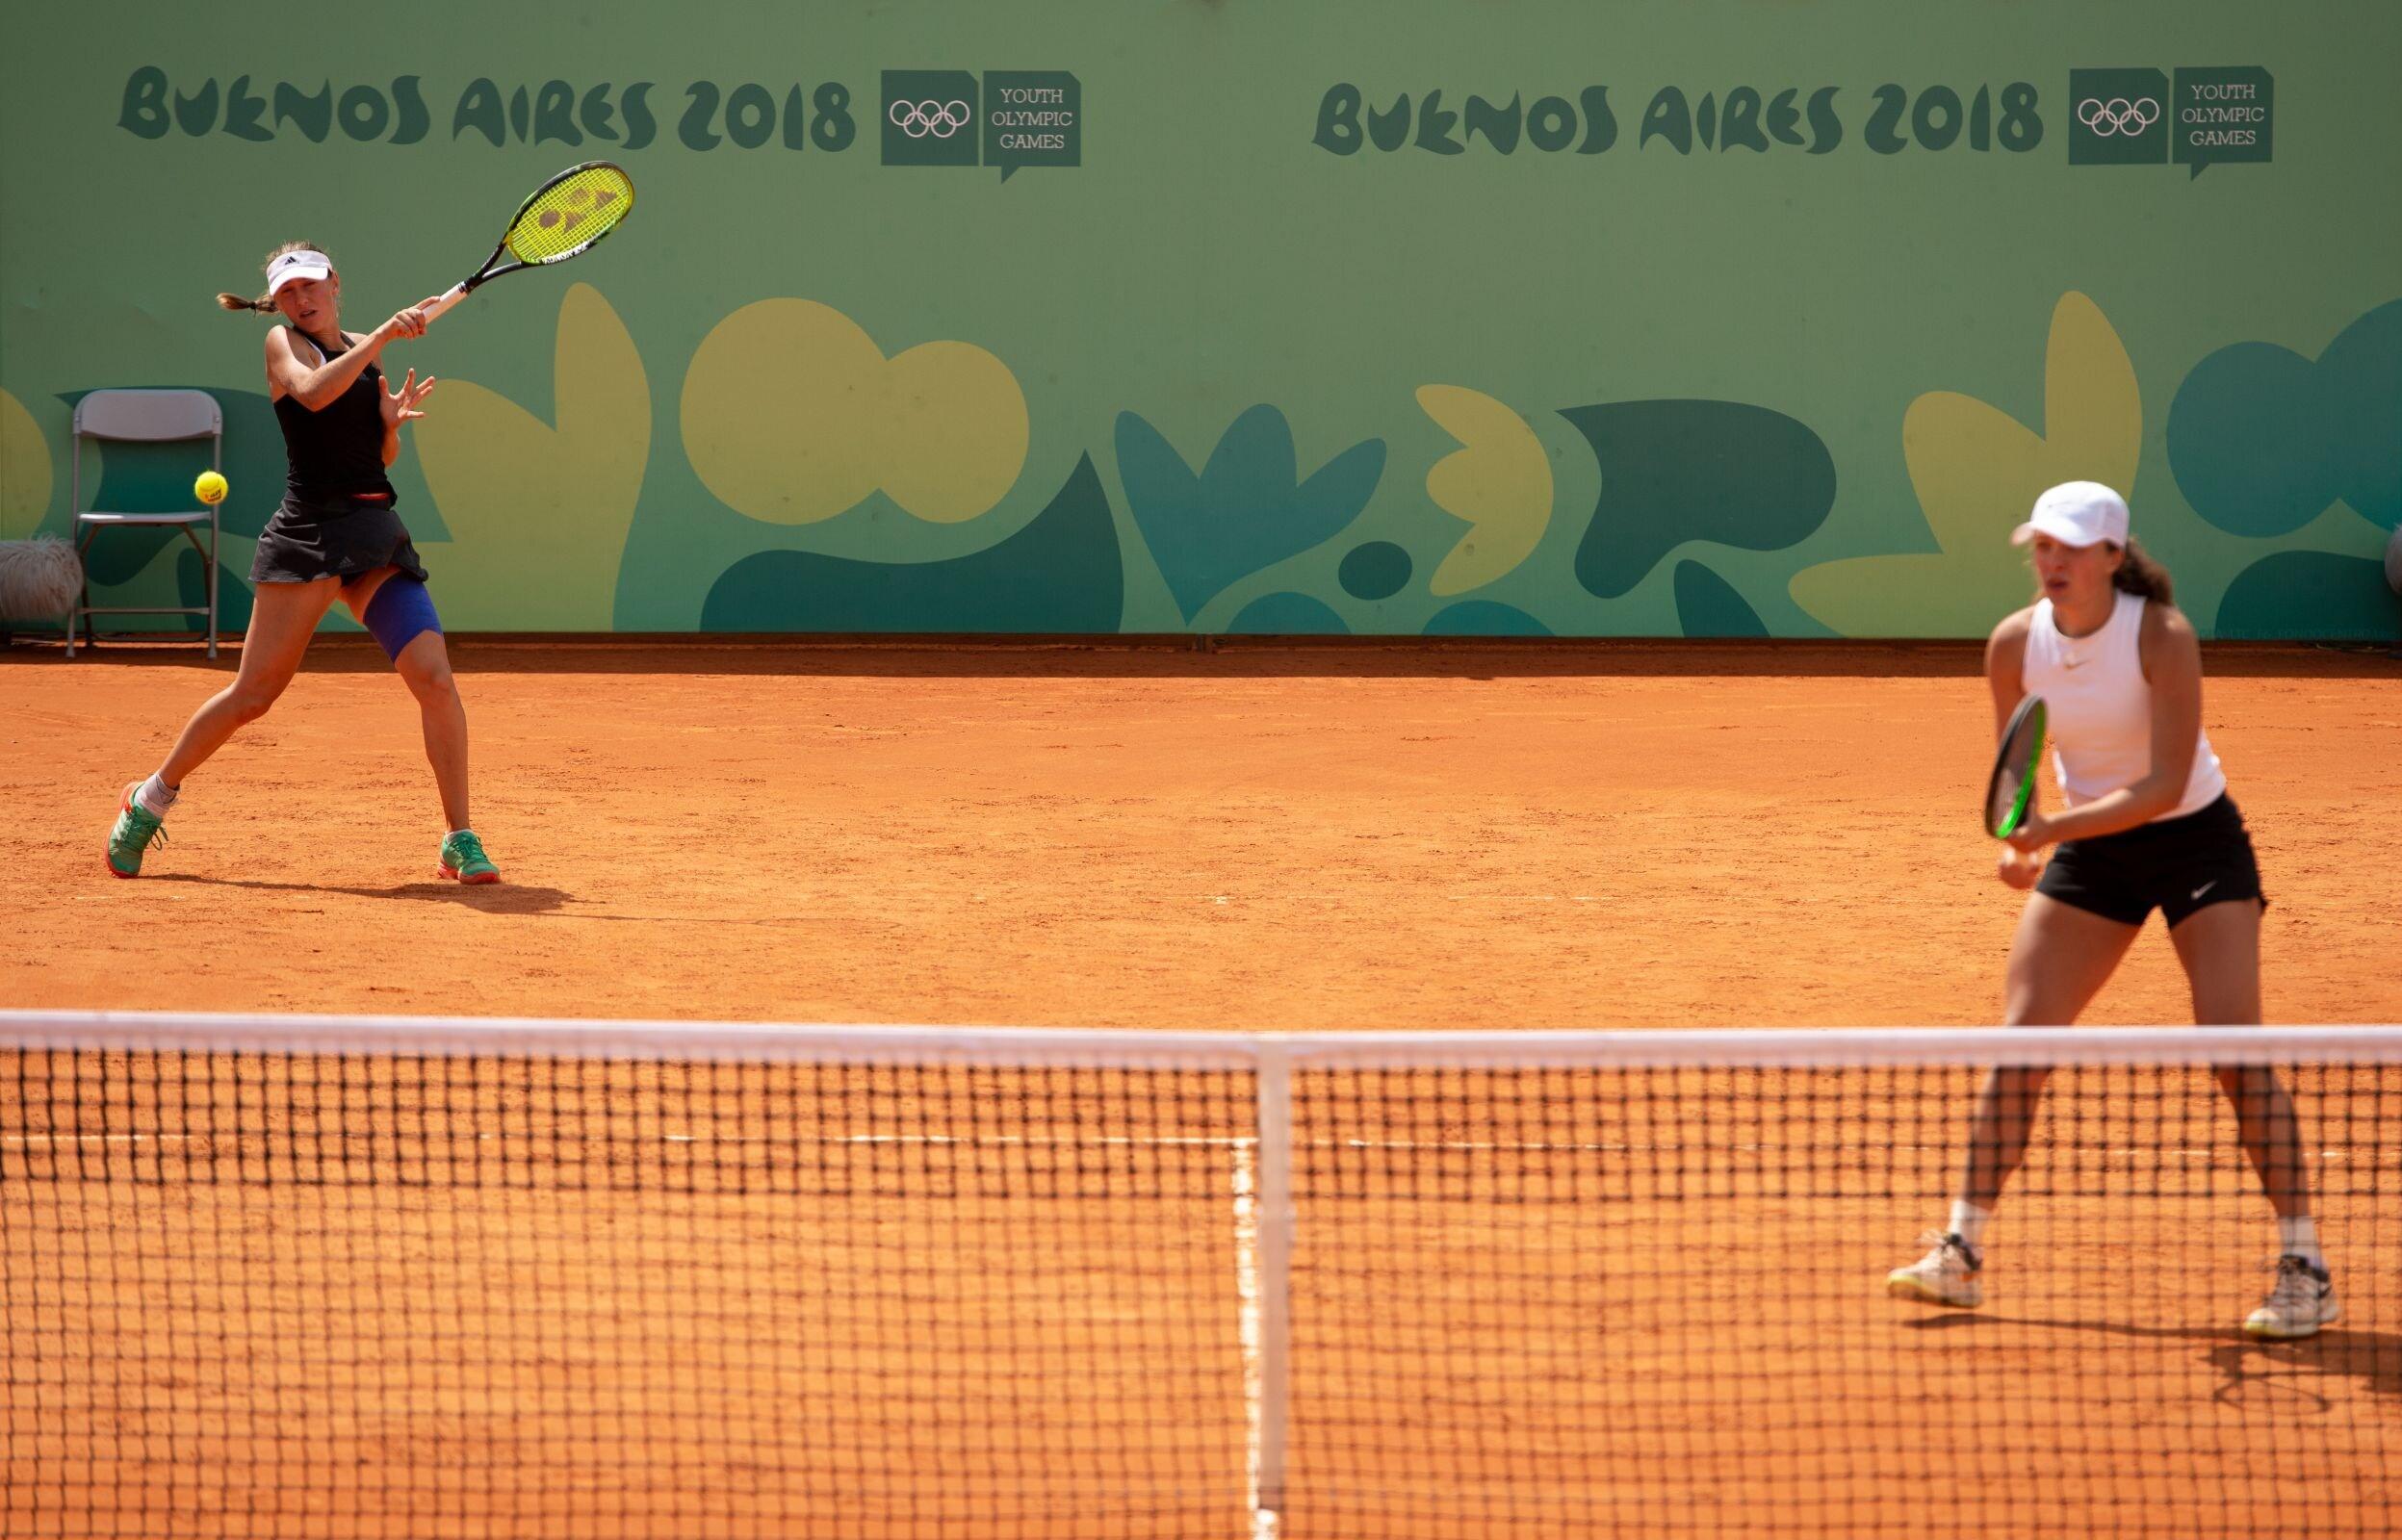 Buenos Aires 2018 - Tennis - Women's Doubles